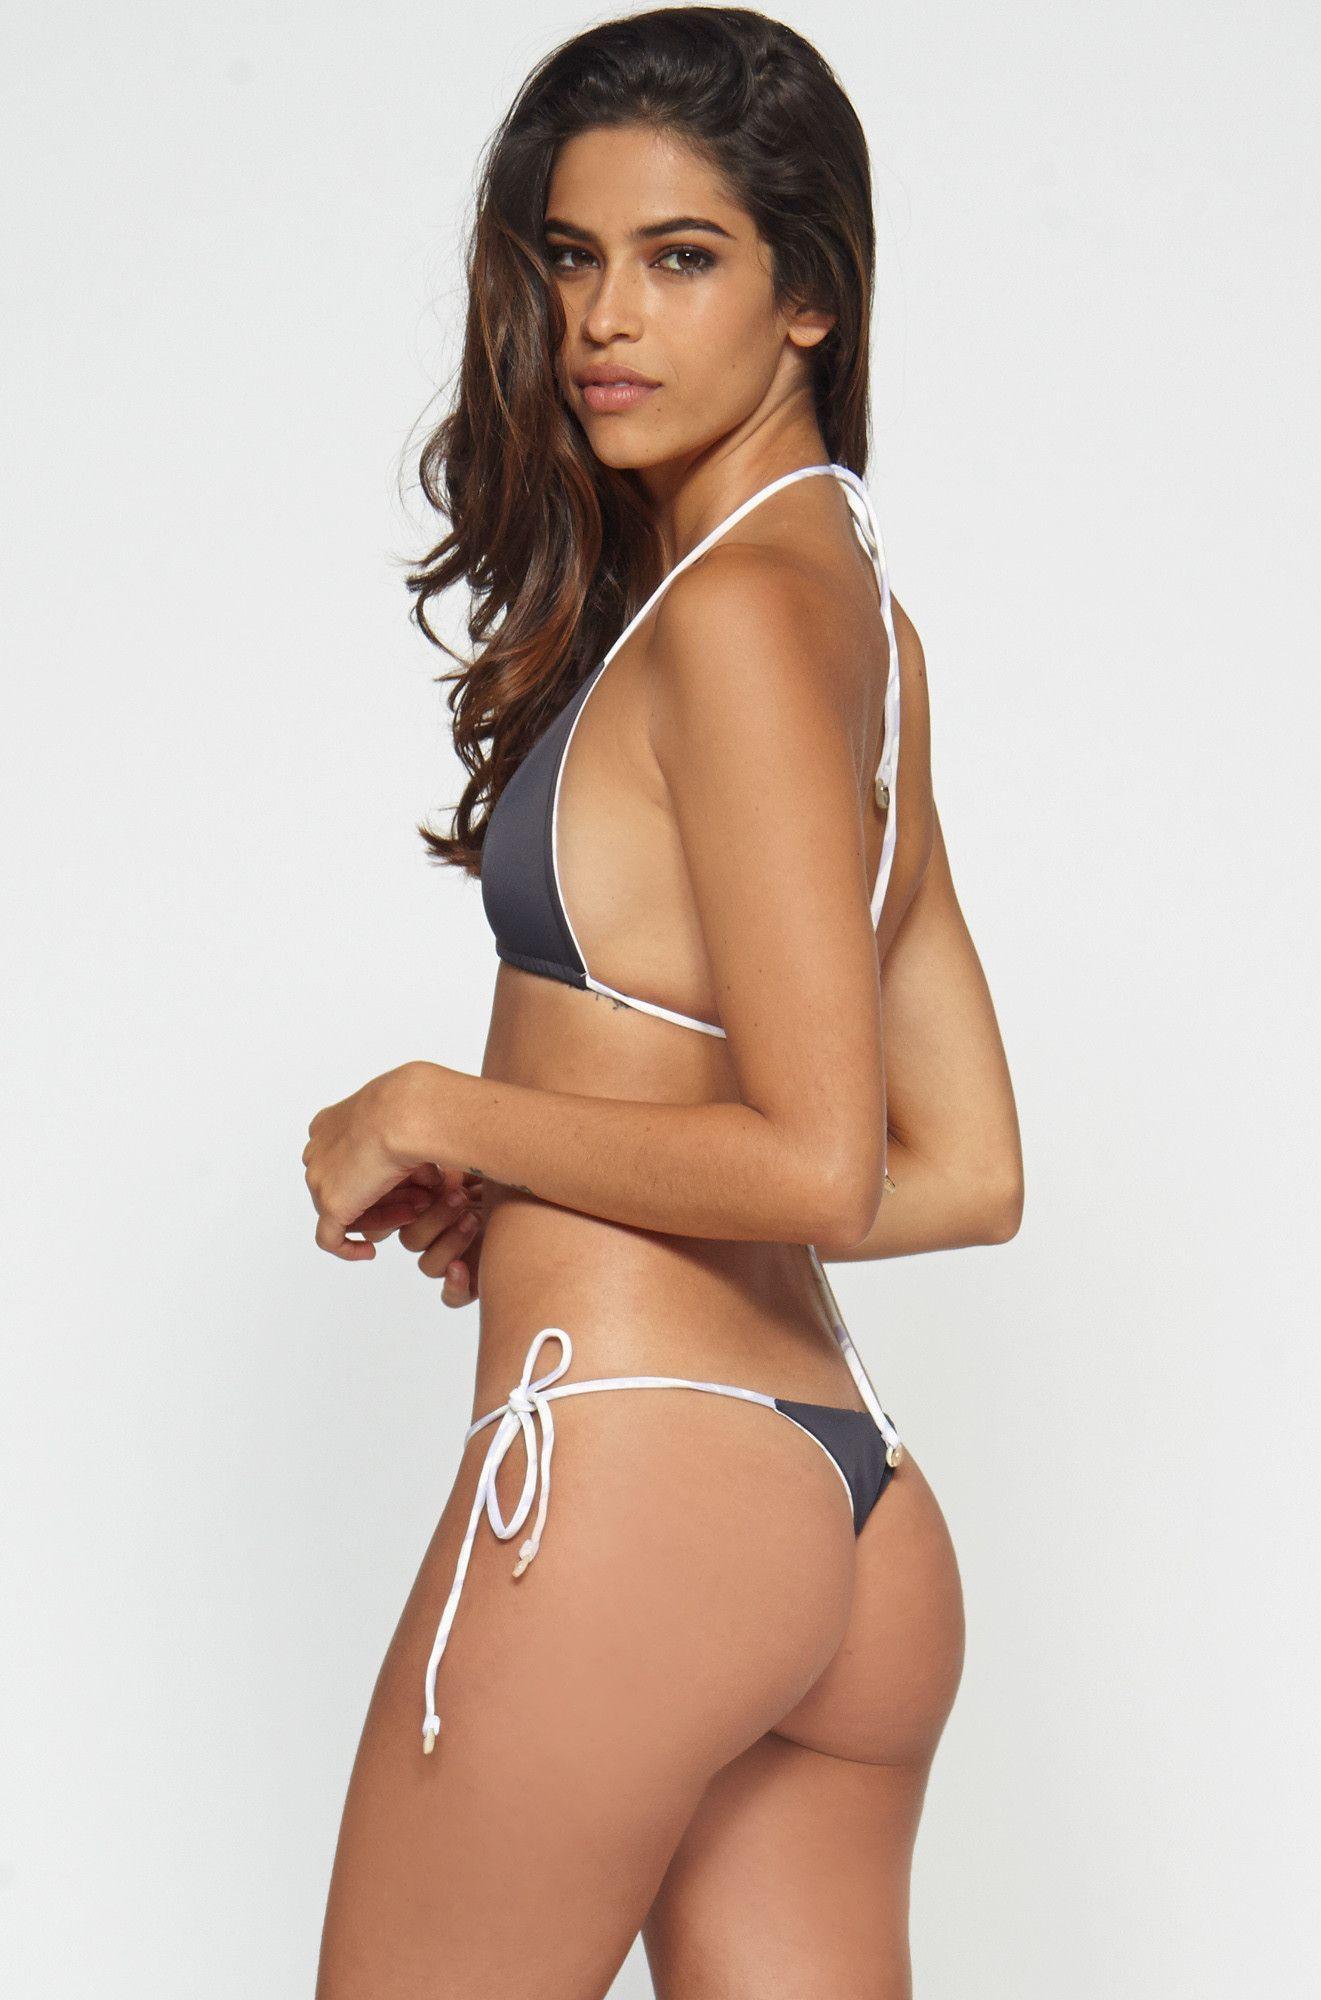 Hacked Juliana Herz nudes (52 photo), Topless, Bikini, Boobs, cleavage 2015